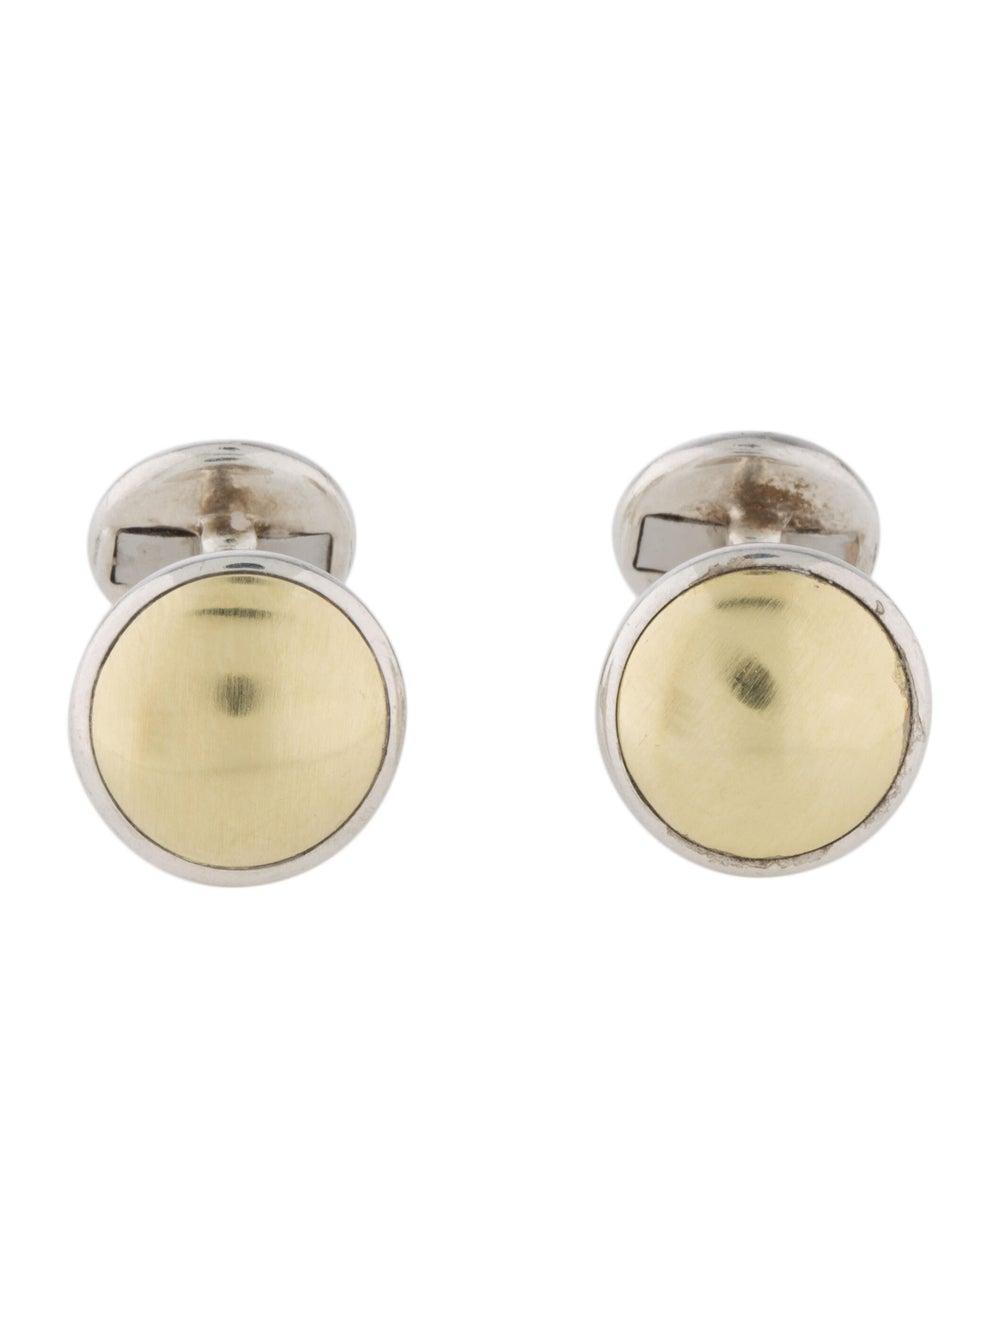 David Yurman Two-Tone Dome Cufflinks Silver - image 2